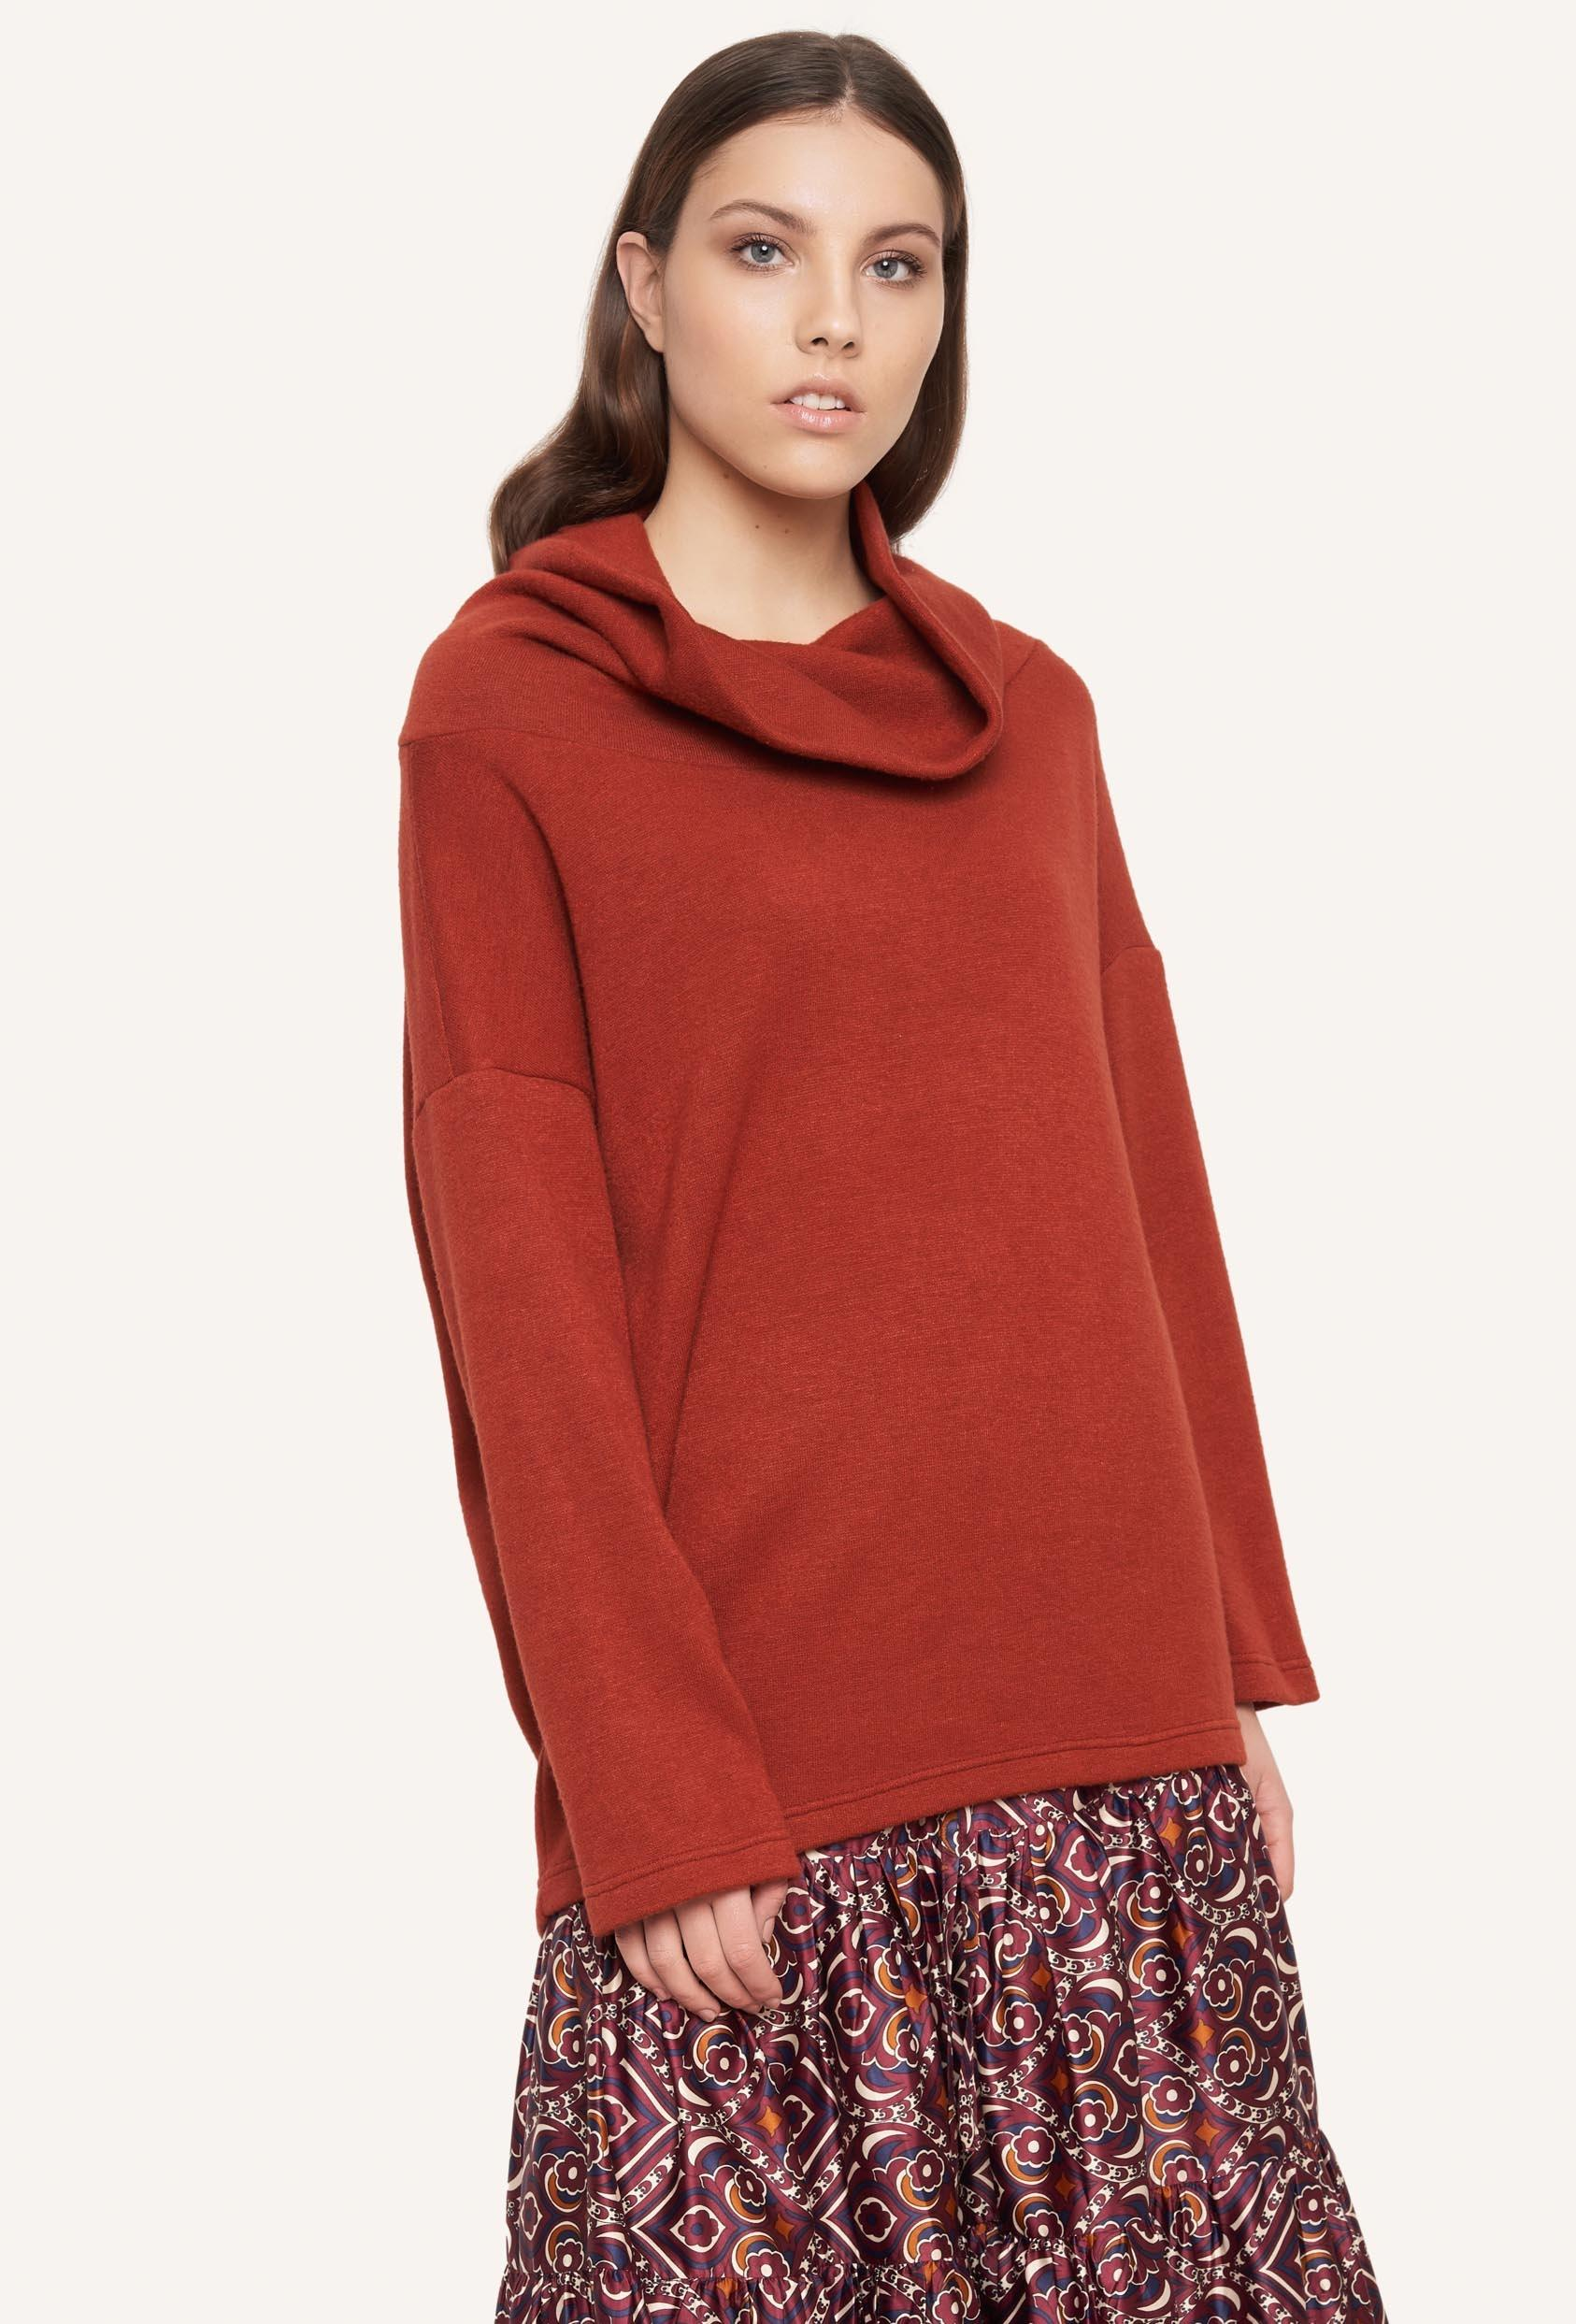 Sweter luźny RACHEL SWEATER rudy_1